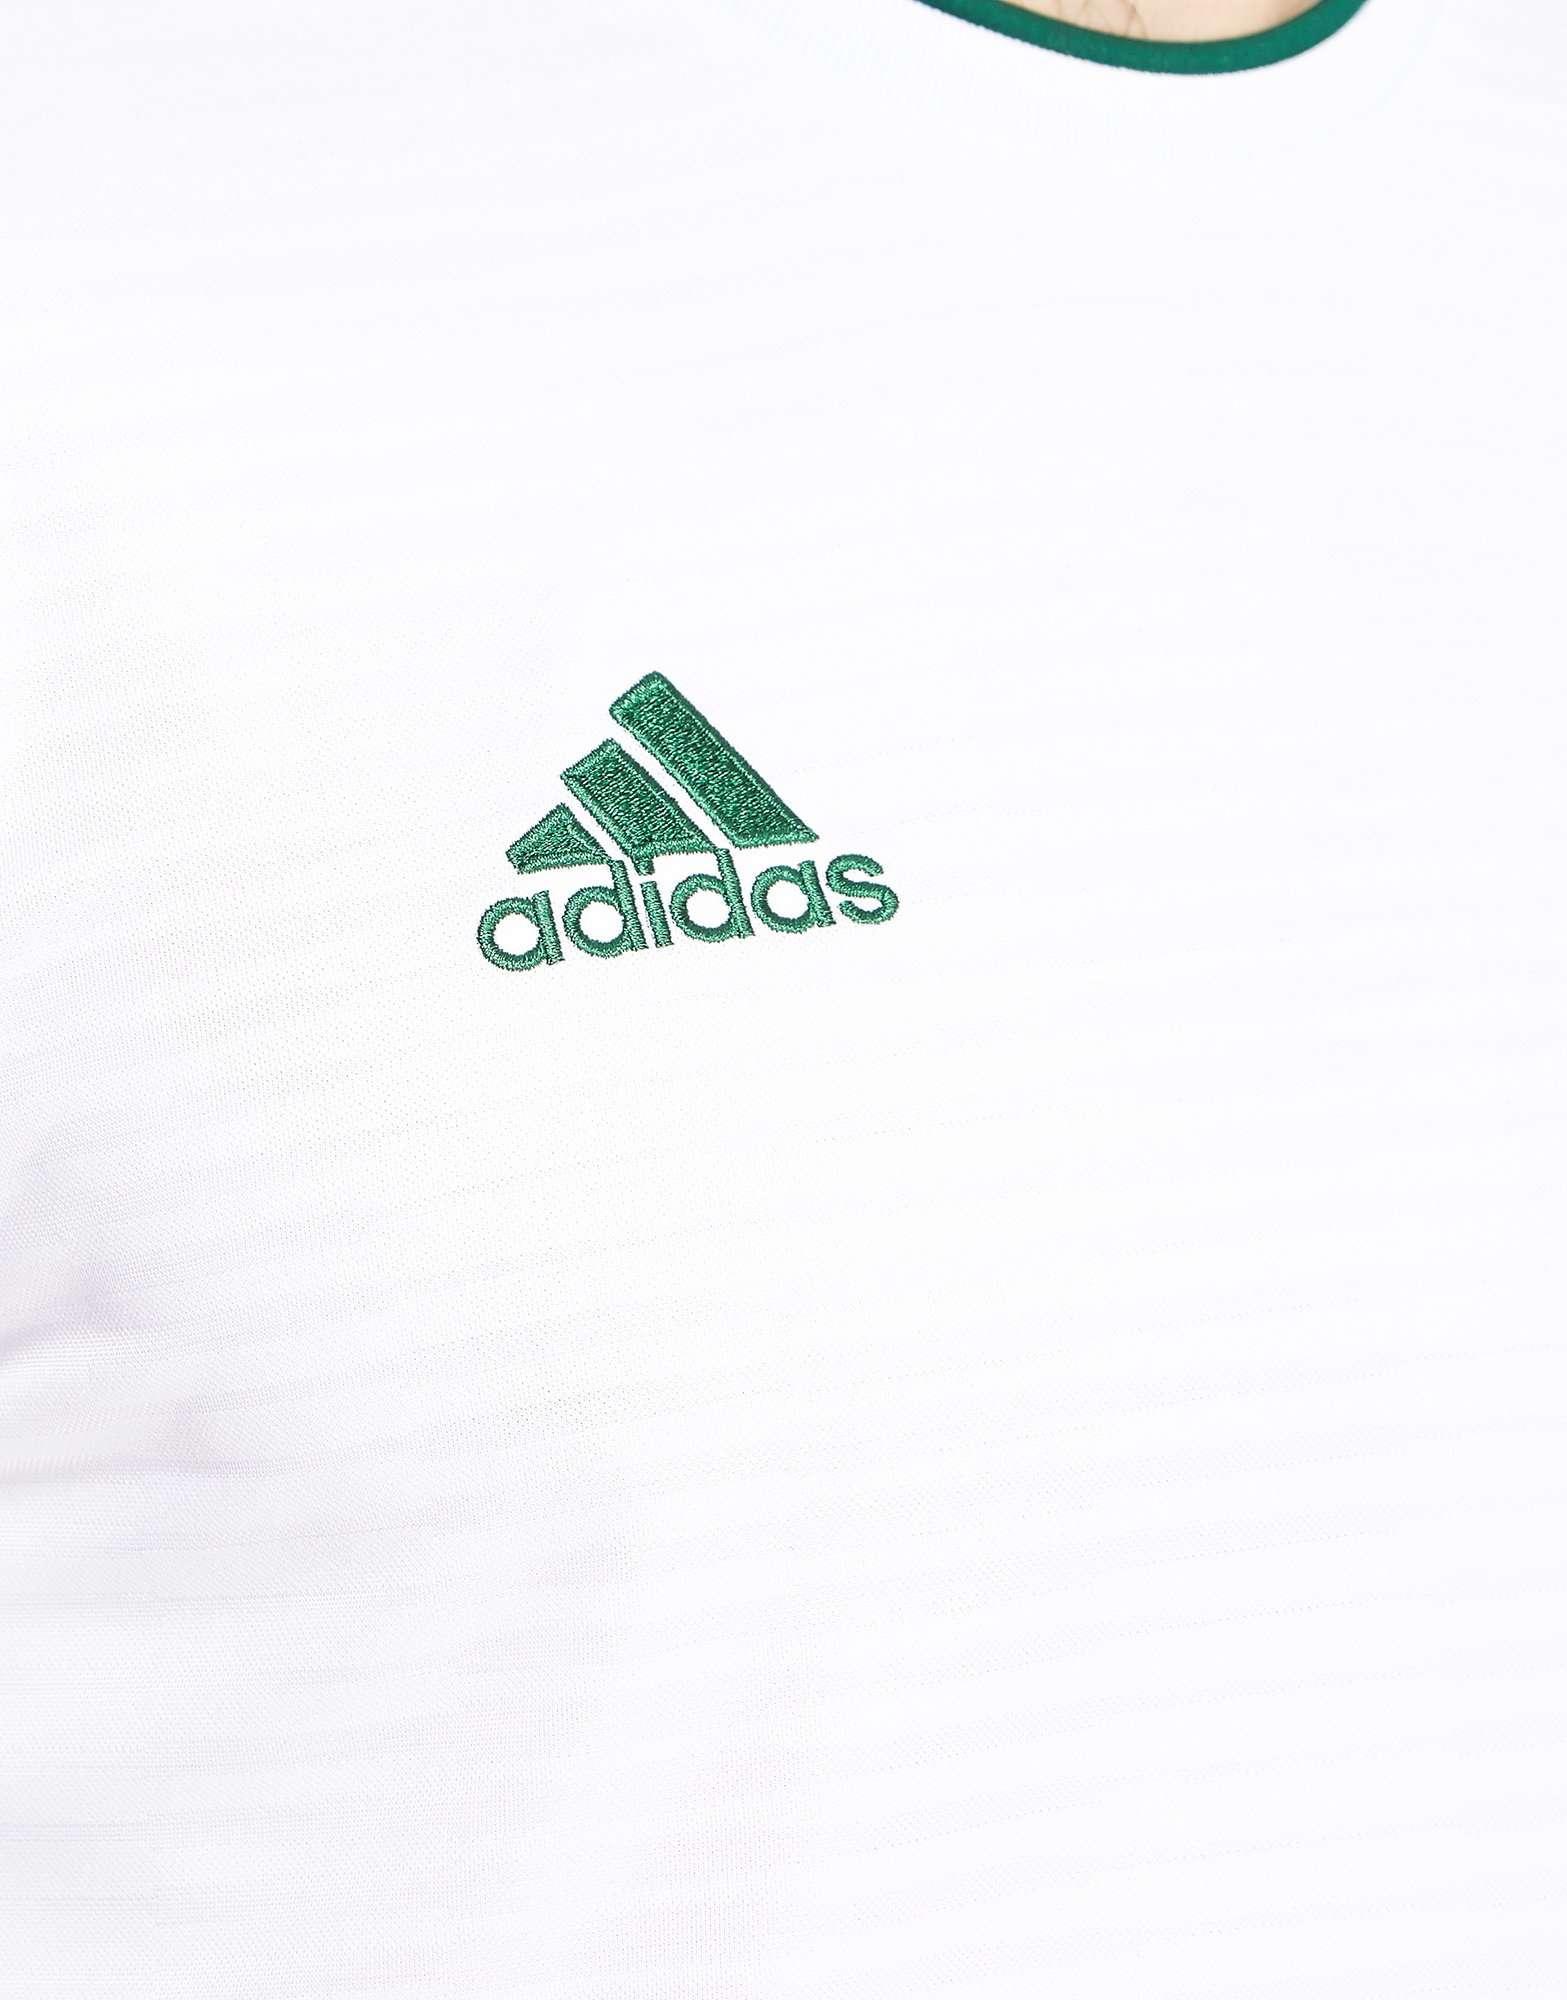 adidas galles 2018 / 19 via camicia jd sports